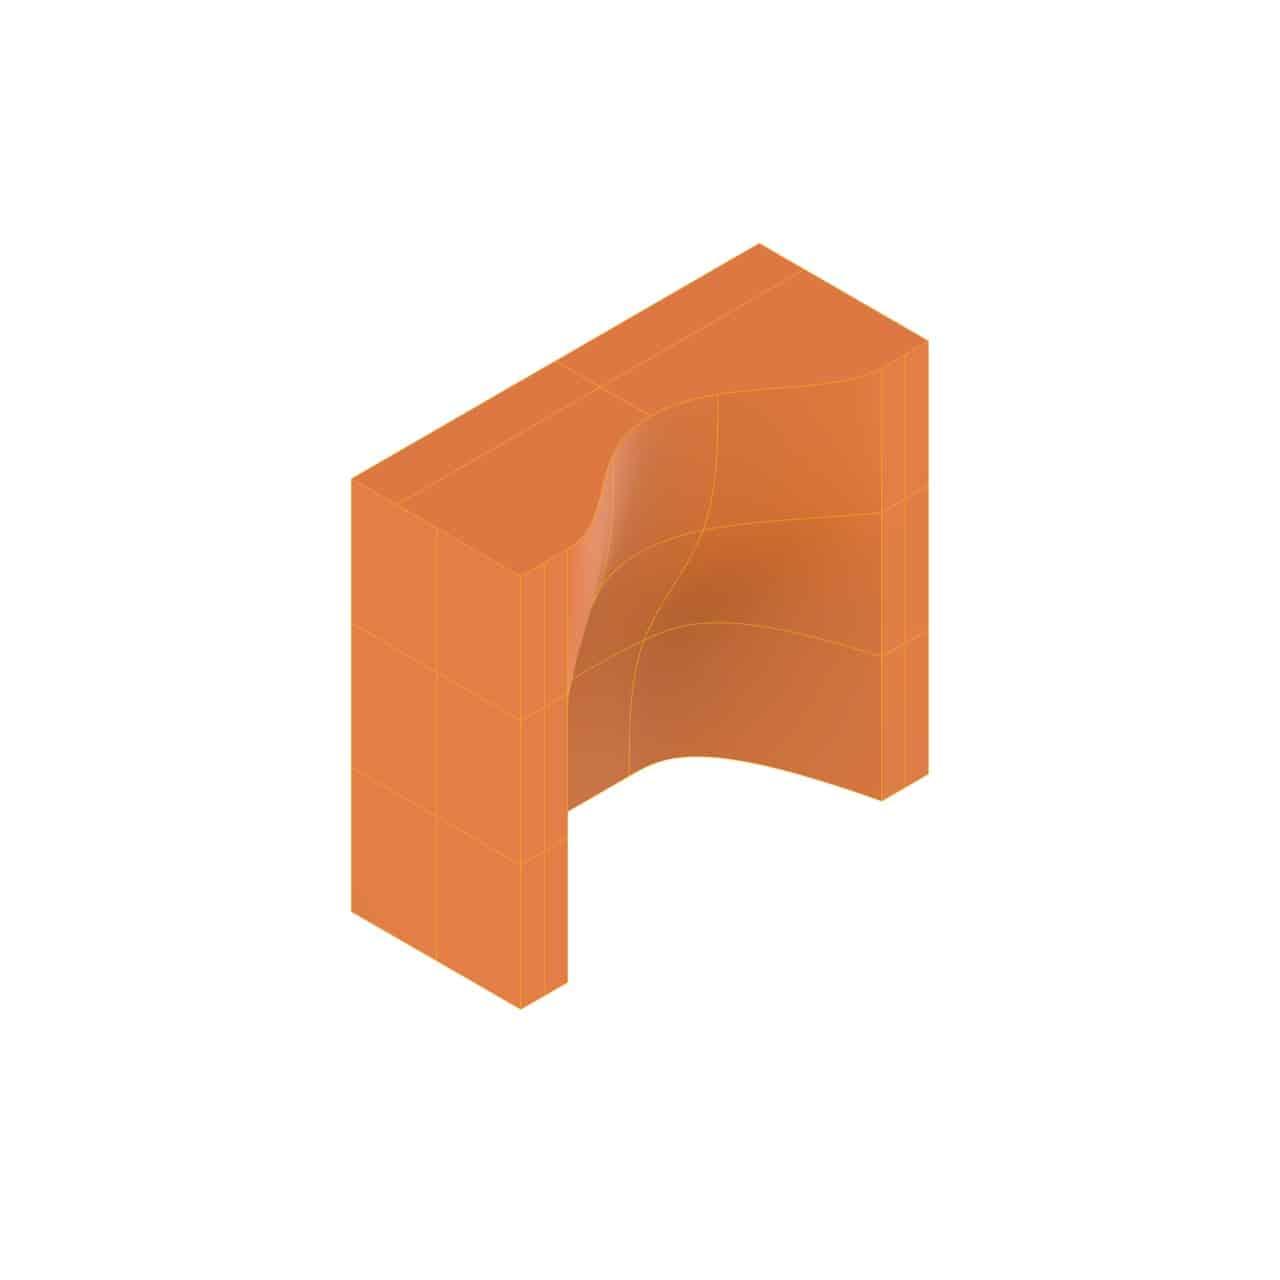 cfrp-3d-print-mold-step-2-post-process-mold